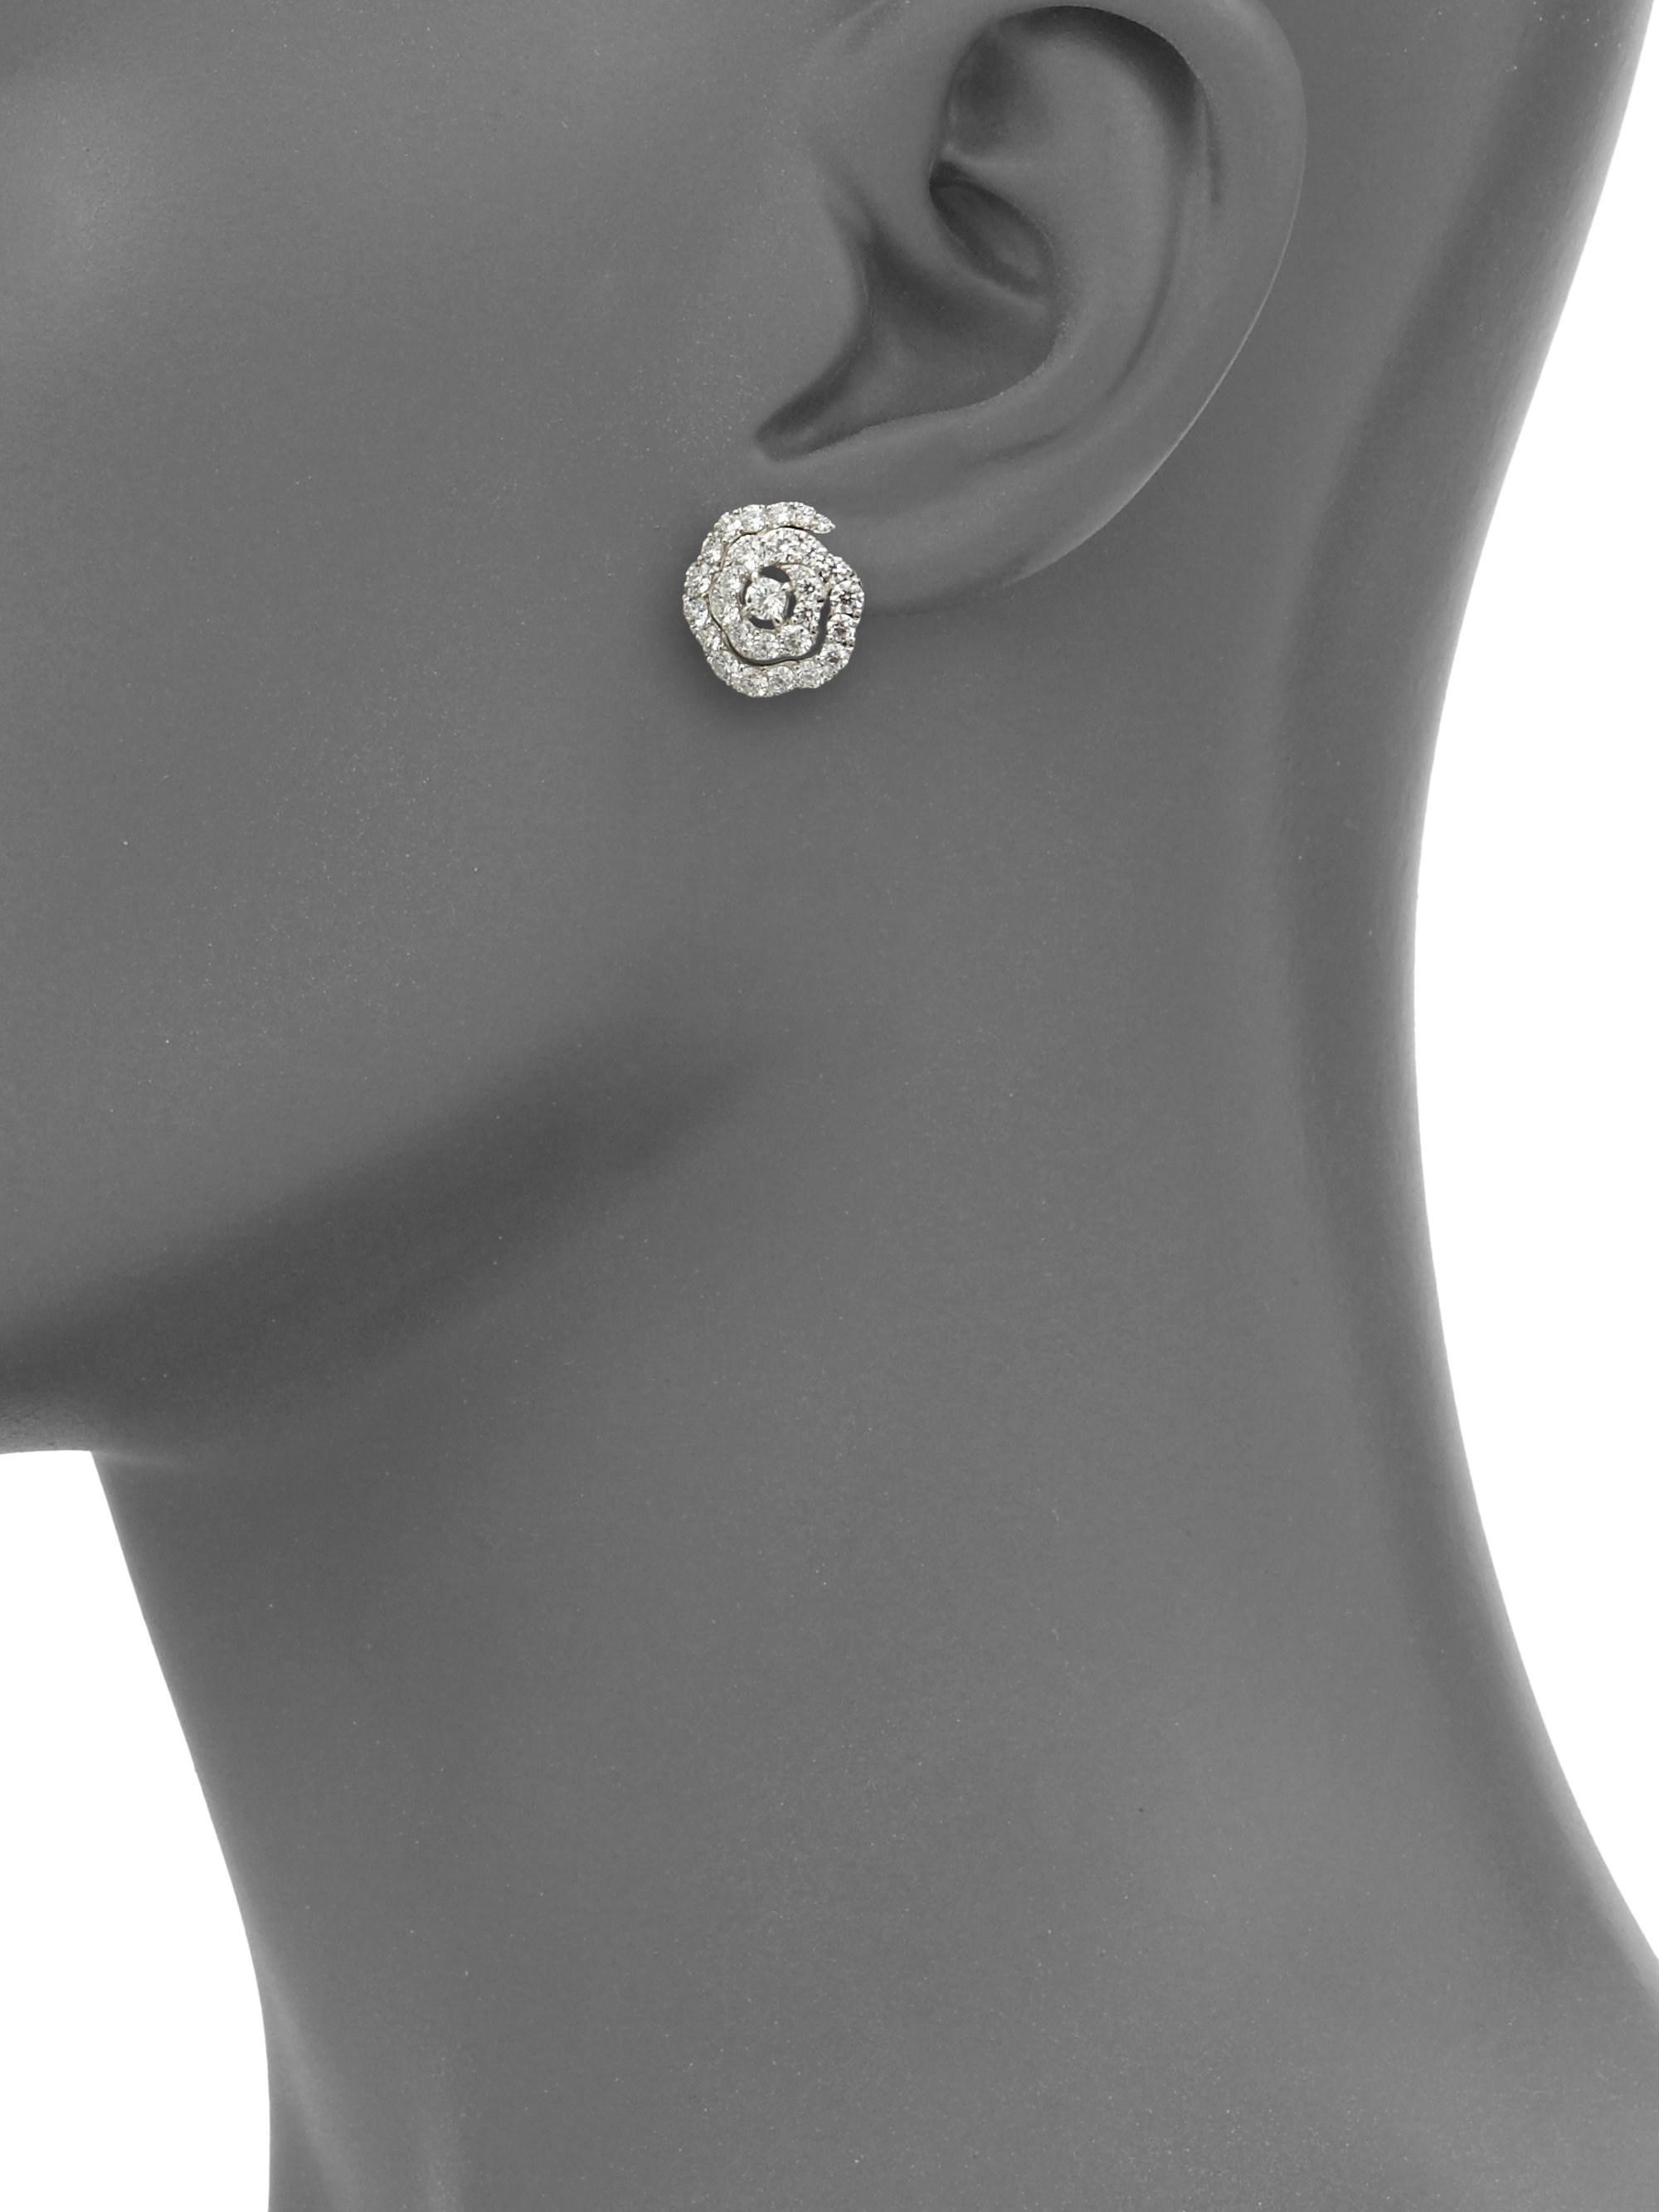 0b0b399d7 ... Diamond & 18k White Gold Floral Stud Earrings - Lyst. View fullscreen